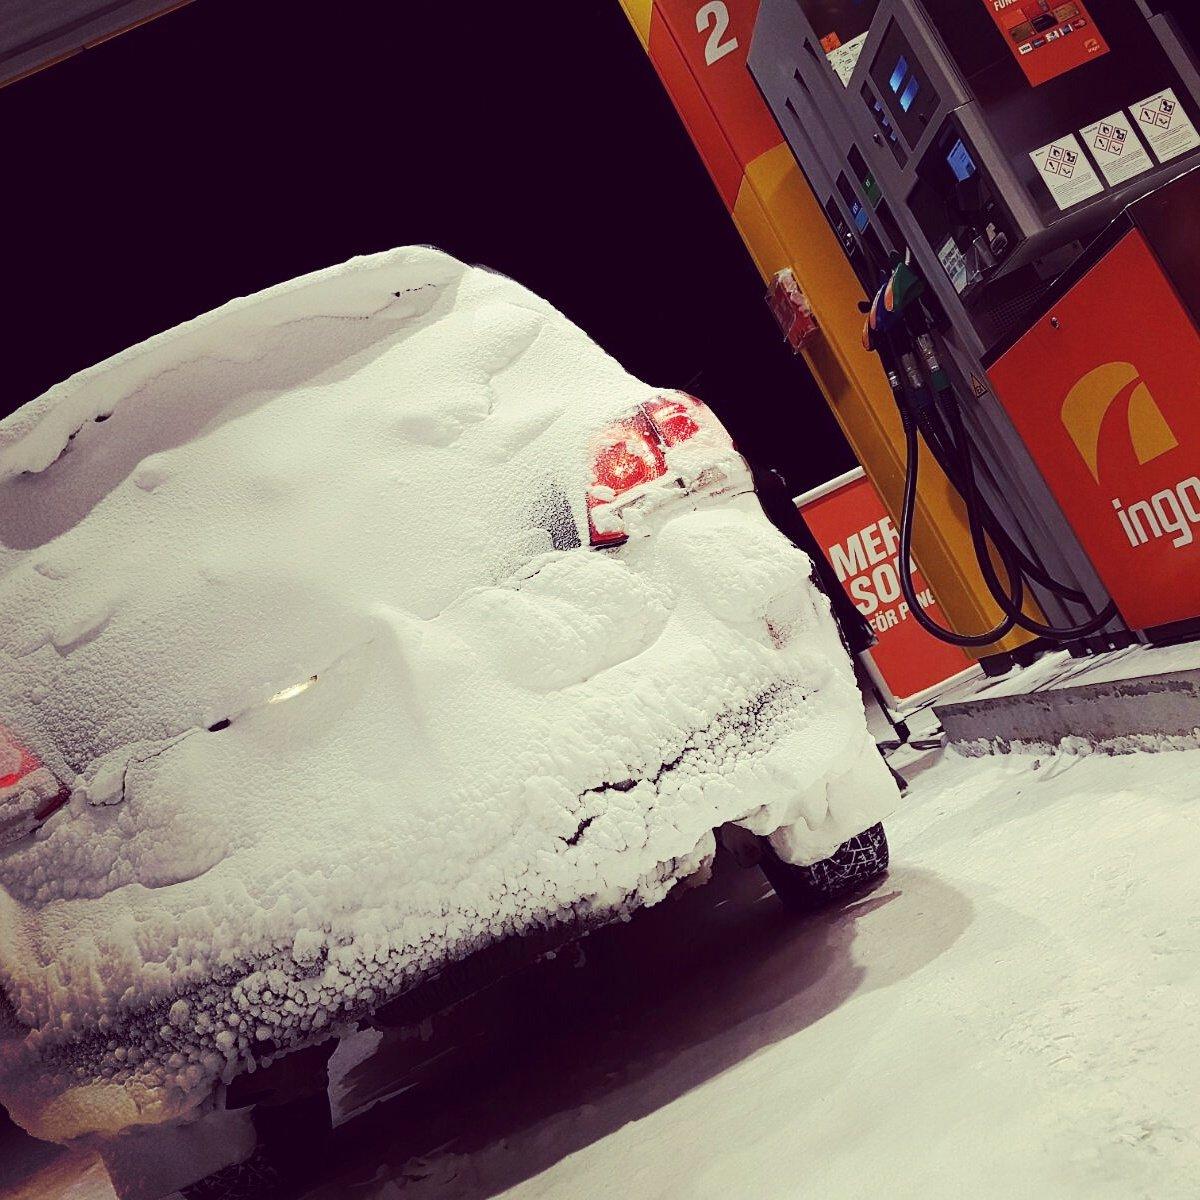 @Avicii where U at ? ♩ lookin' for ya in Arjeplog #avicii #sweden #music #hitmakers #newmusic #edm #housemusic #dj #snowcar #arjeplog #inspiration #musicproduction #ontheroad #roadtour #landcruiser #landcruiser200  #dt #doubletrouble #thedoubletroubles #iceroadpic.twitter.com/5QZQlhPL4U